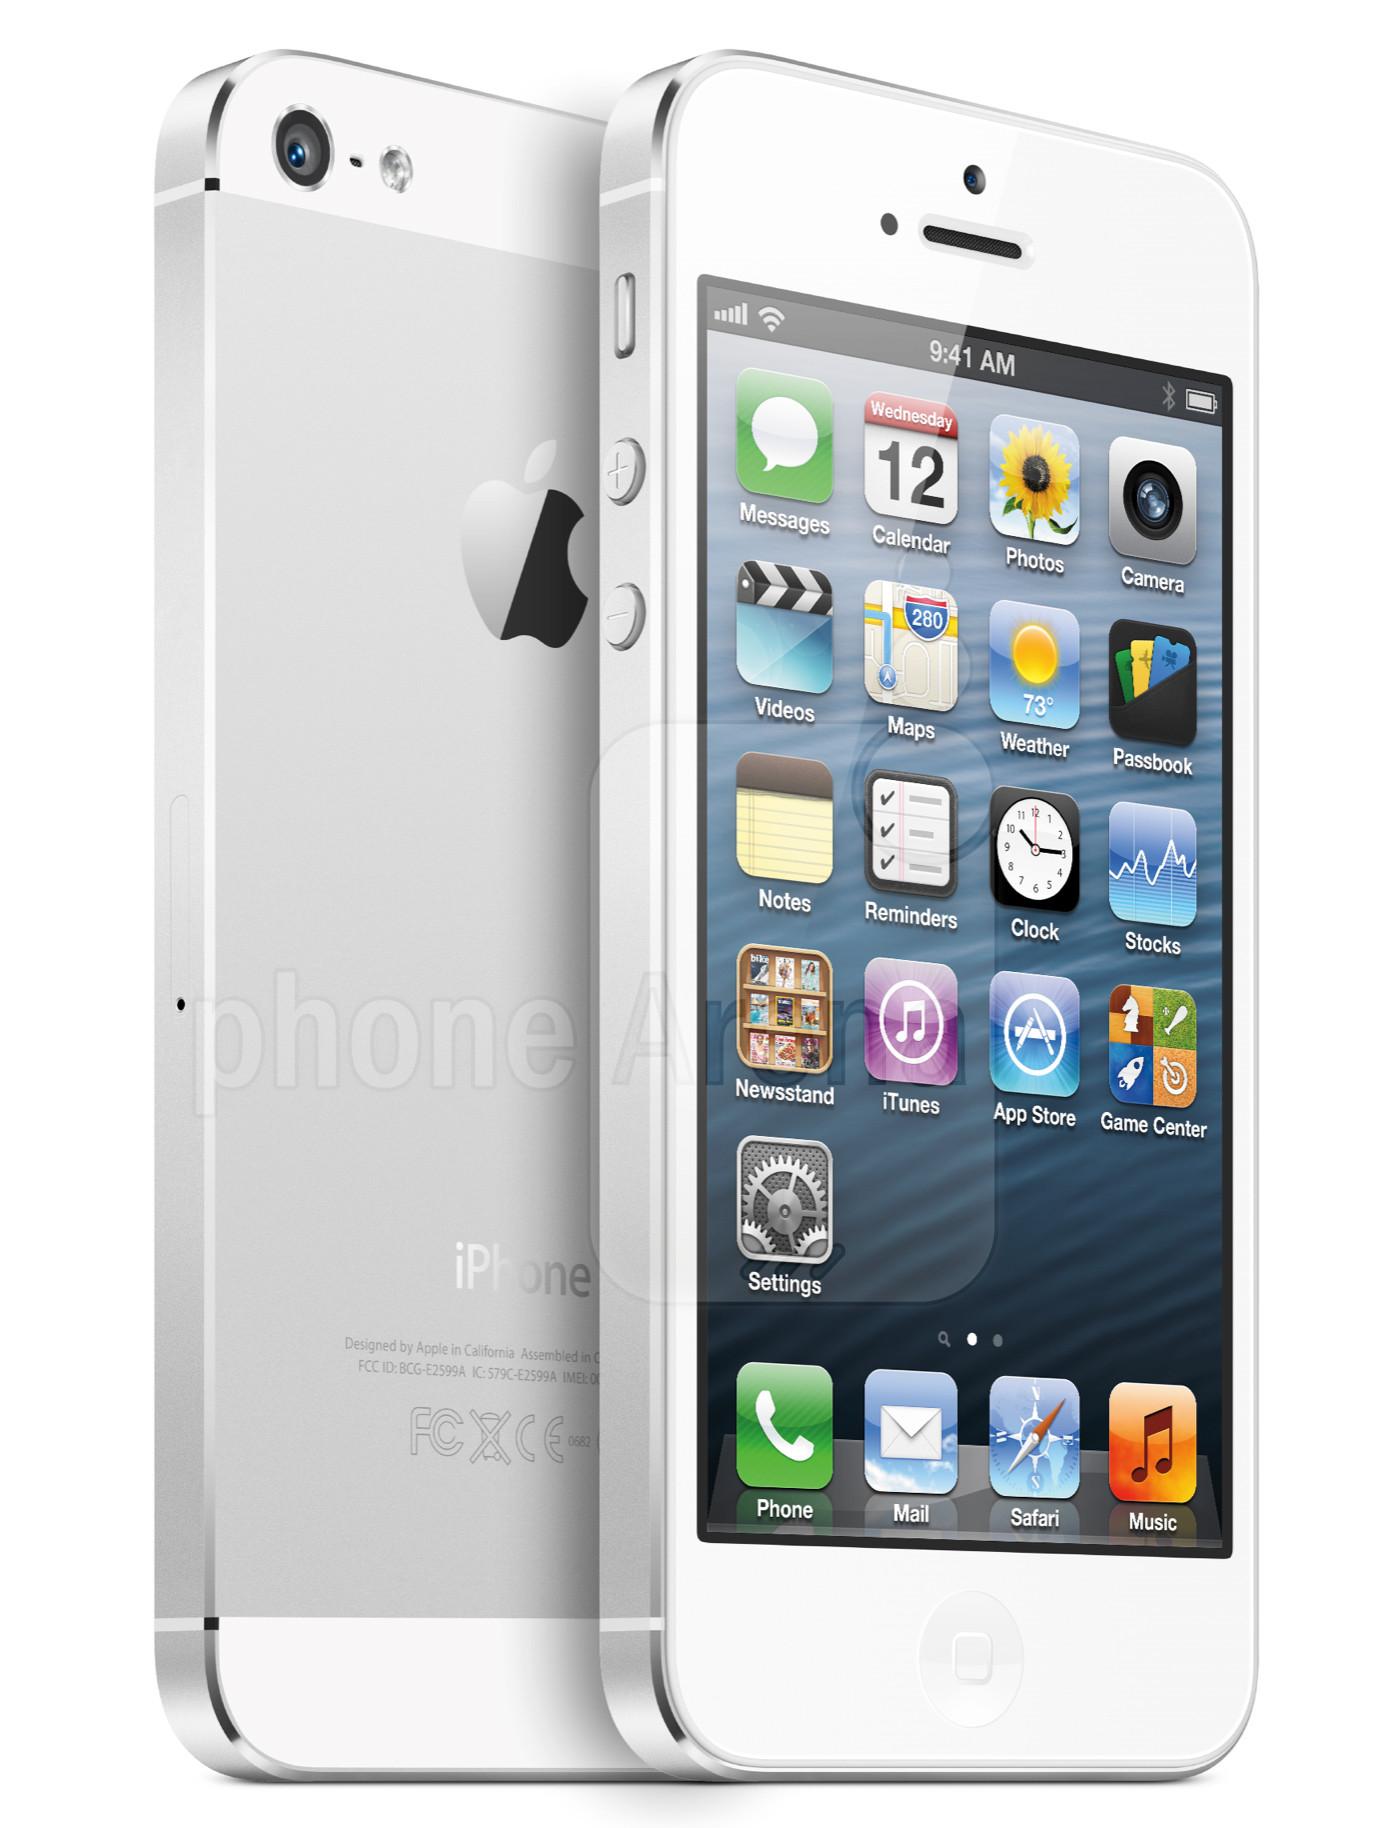 Apple iPhone 5 3